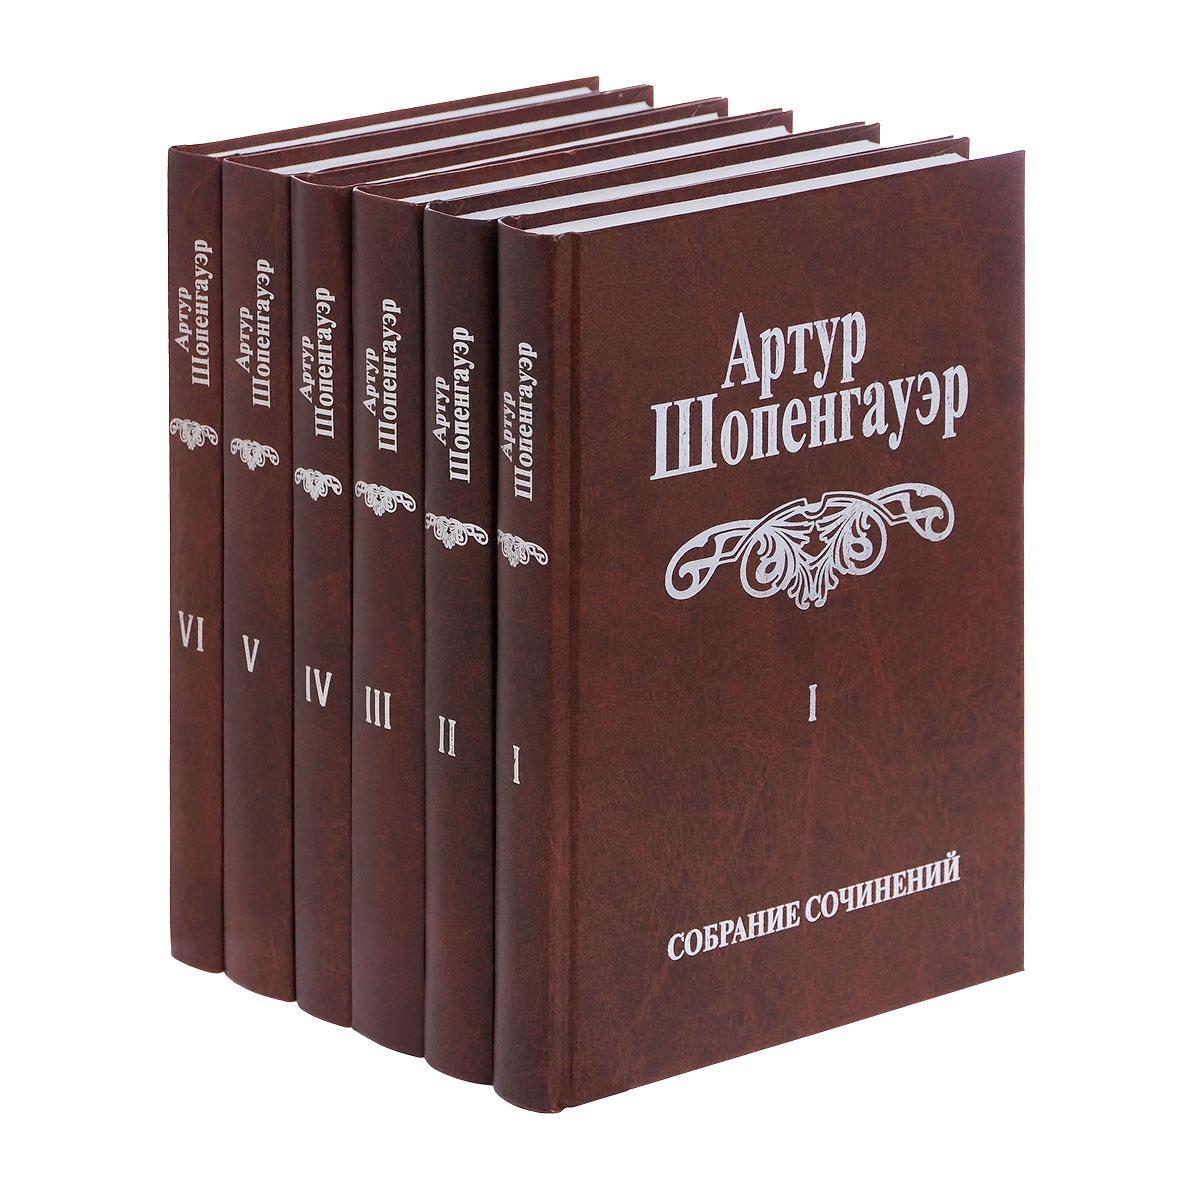 Артур Шопенгауэр Артур Шопенгауэр. Собрание сочинений в 6 томах (комплект из 6 книг) собрание сочинений в 6 томах